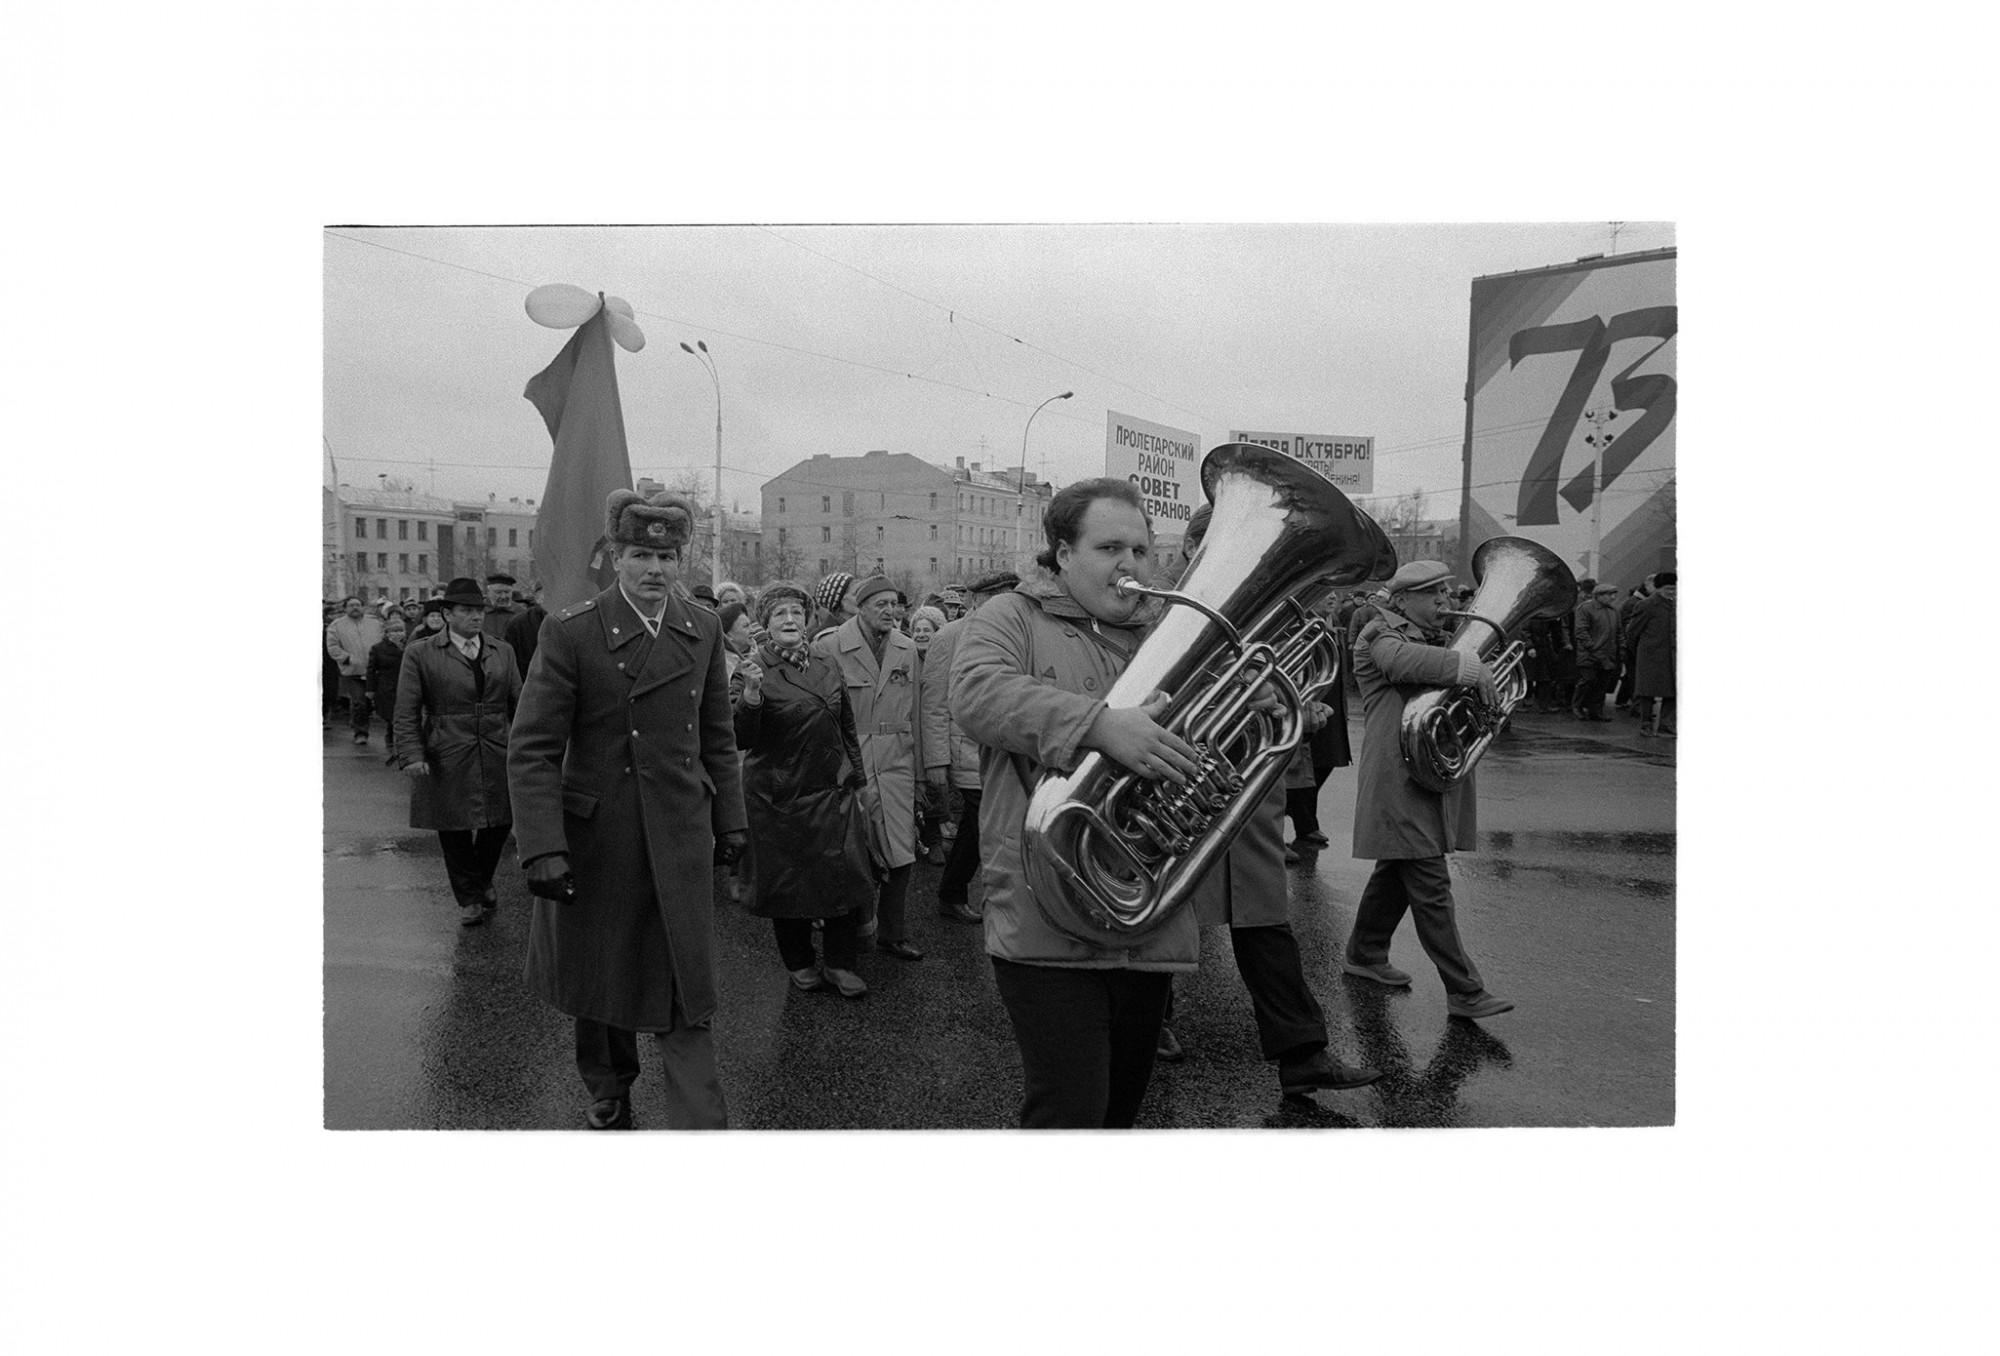 Afbeelding: Moskou 1990, Glasnost & Perestrojka, fotografie Dominique Van Huffel.